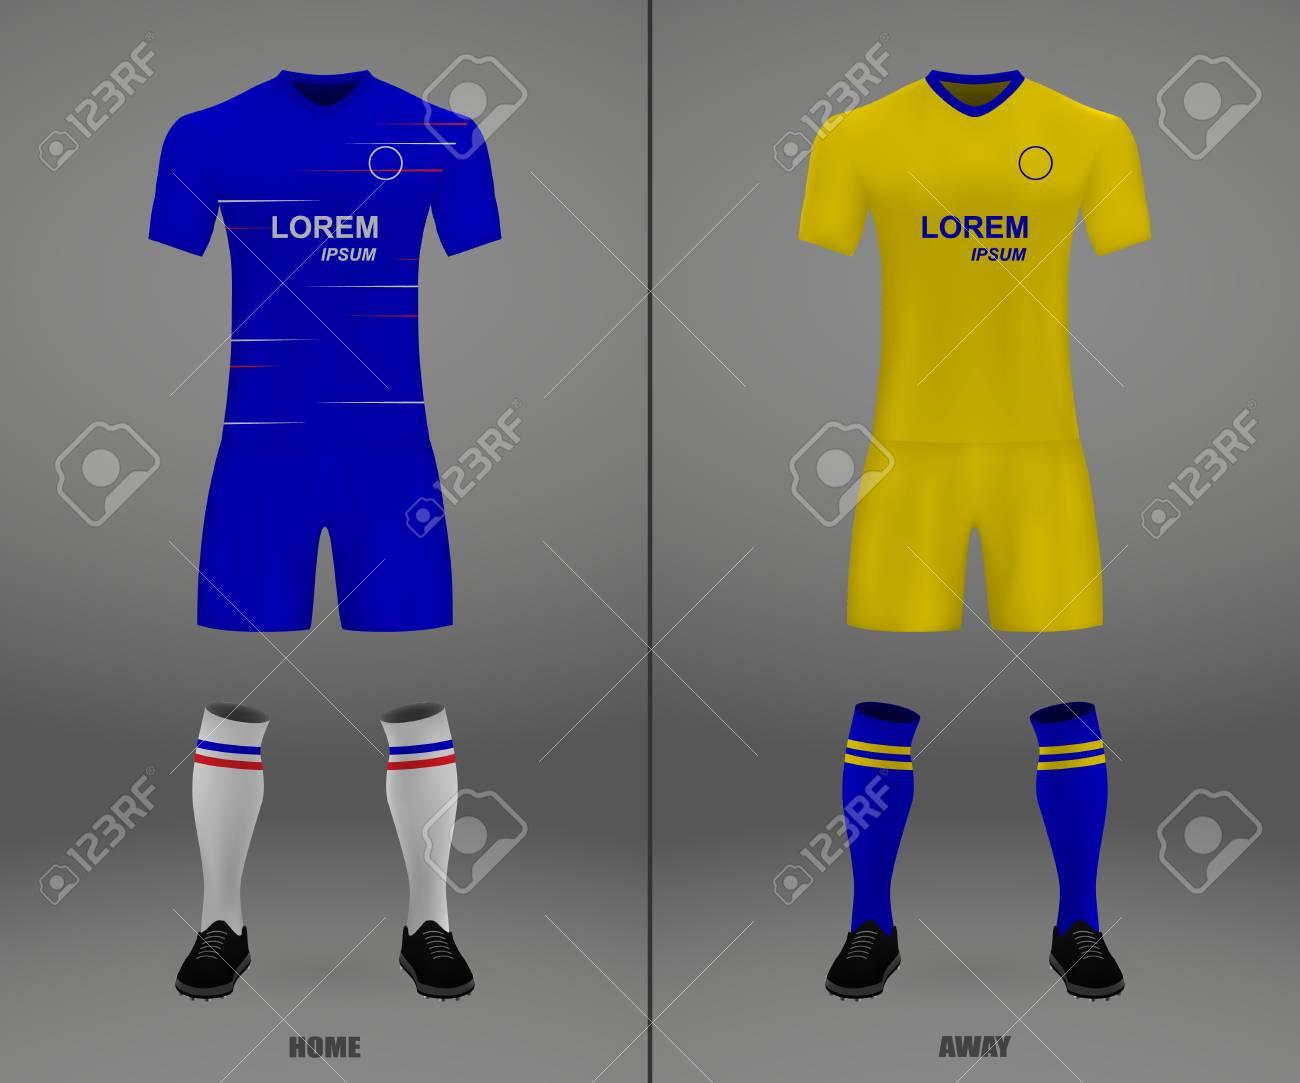 sale retailer 78e35 a1c3f football kit Chelsea 2018-19, shirt template for soccer jersey...